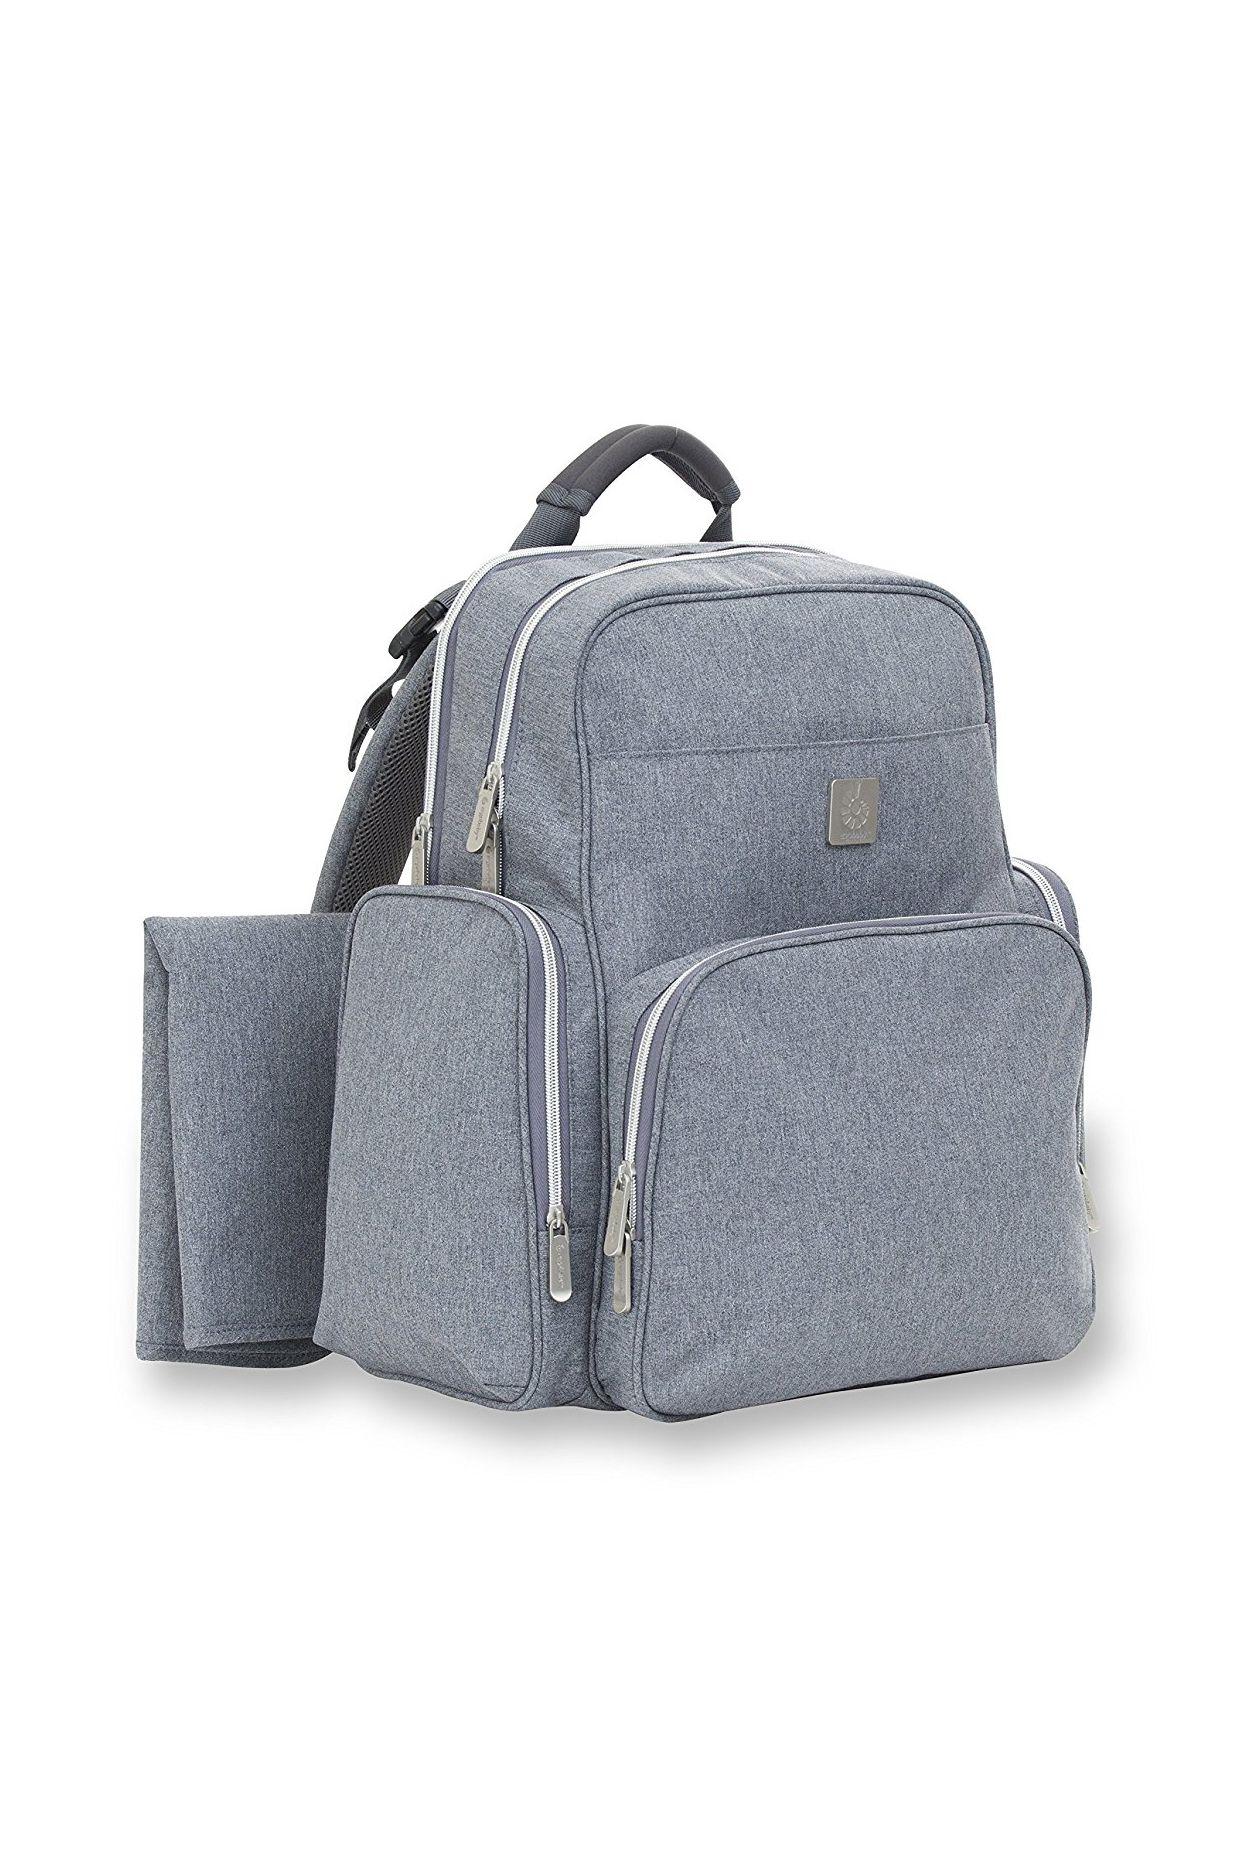 Best Baby Backpack Diaper Bag - CEAGESP